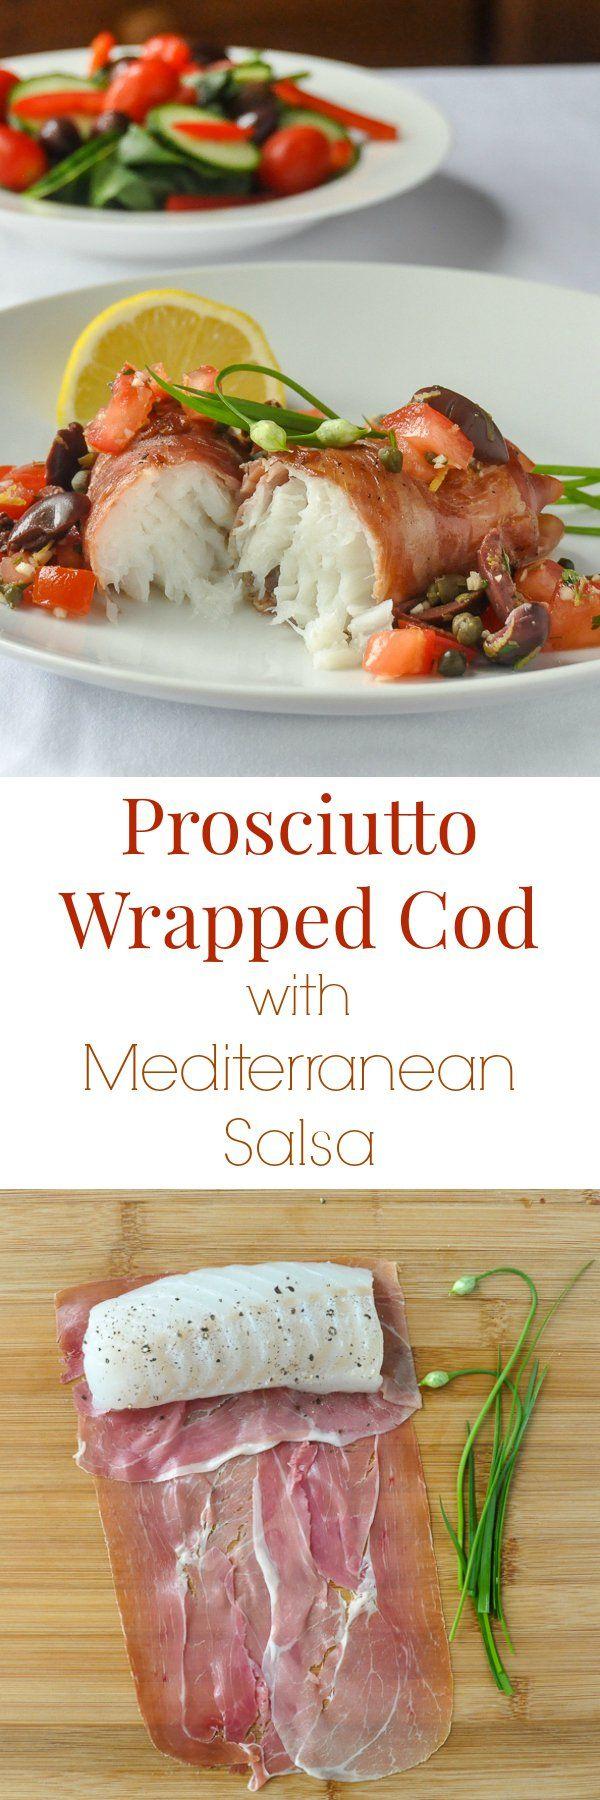 Prosciutto Wrapped Cod with Mediterranean Salsa - beautiful fresh north Atlantic cod wrapped in prosciutto and served with a Mediterranean inspired salsa.